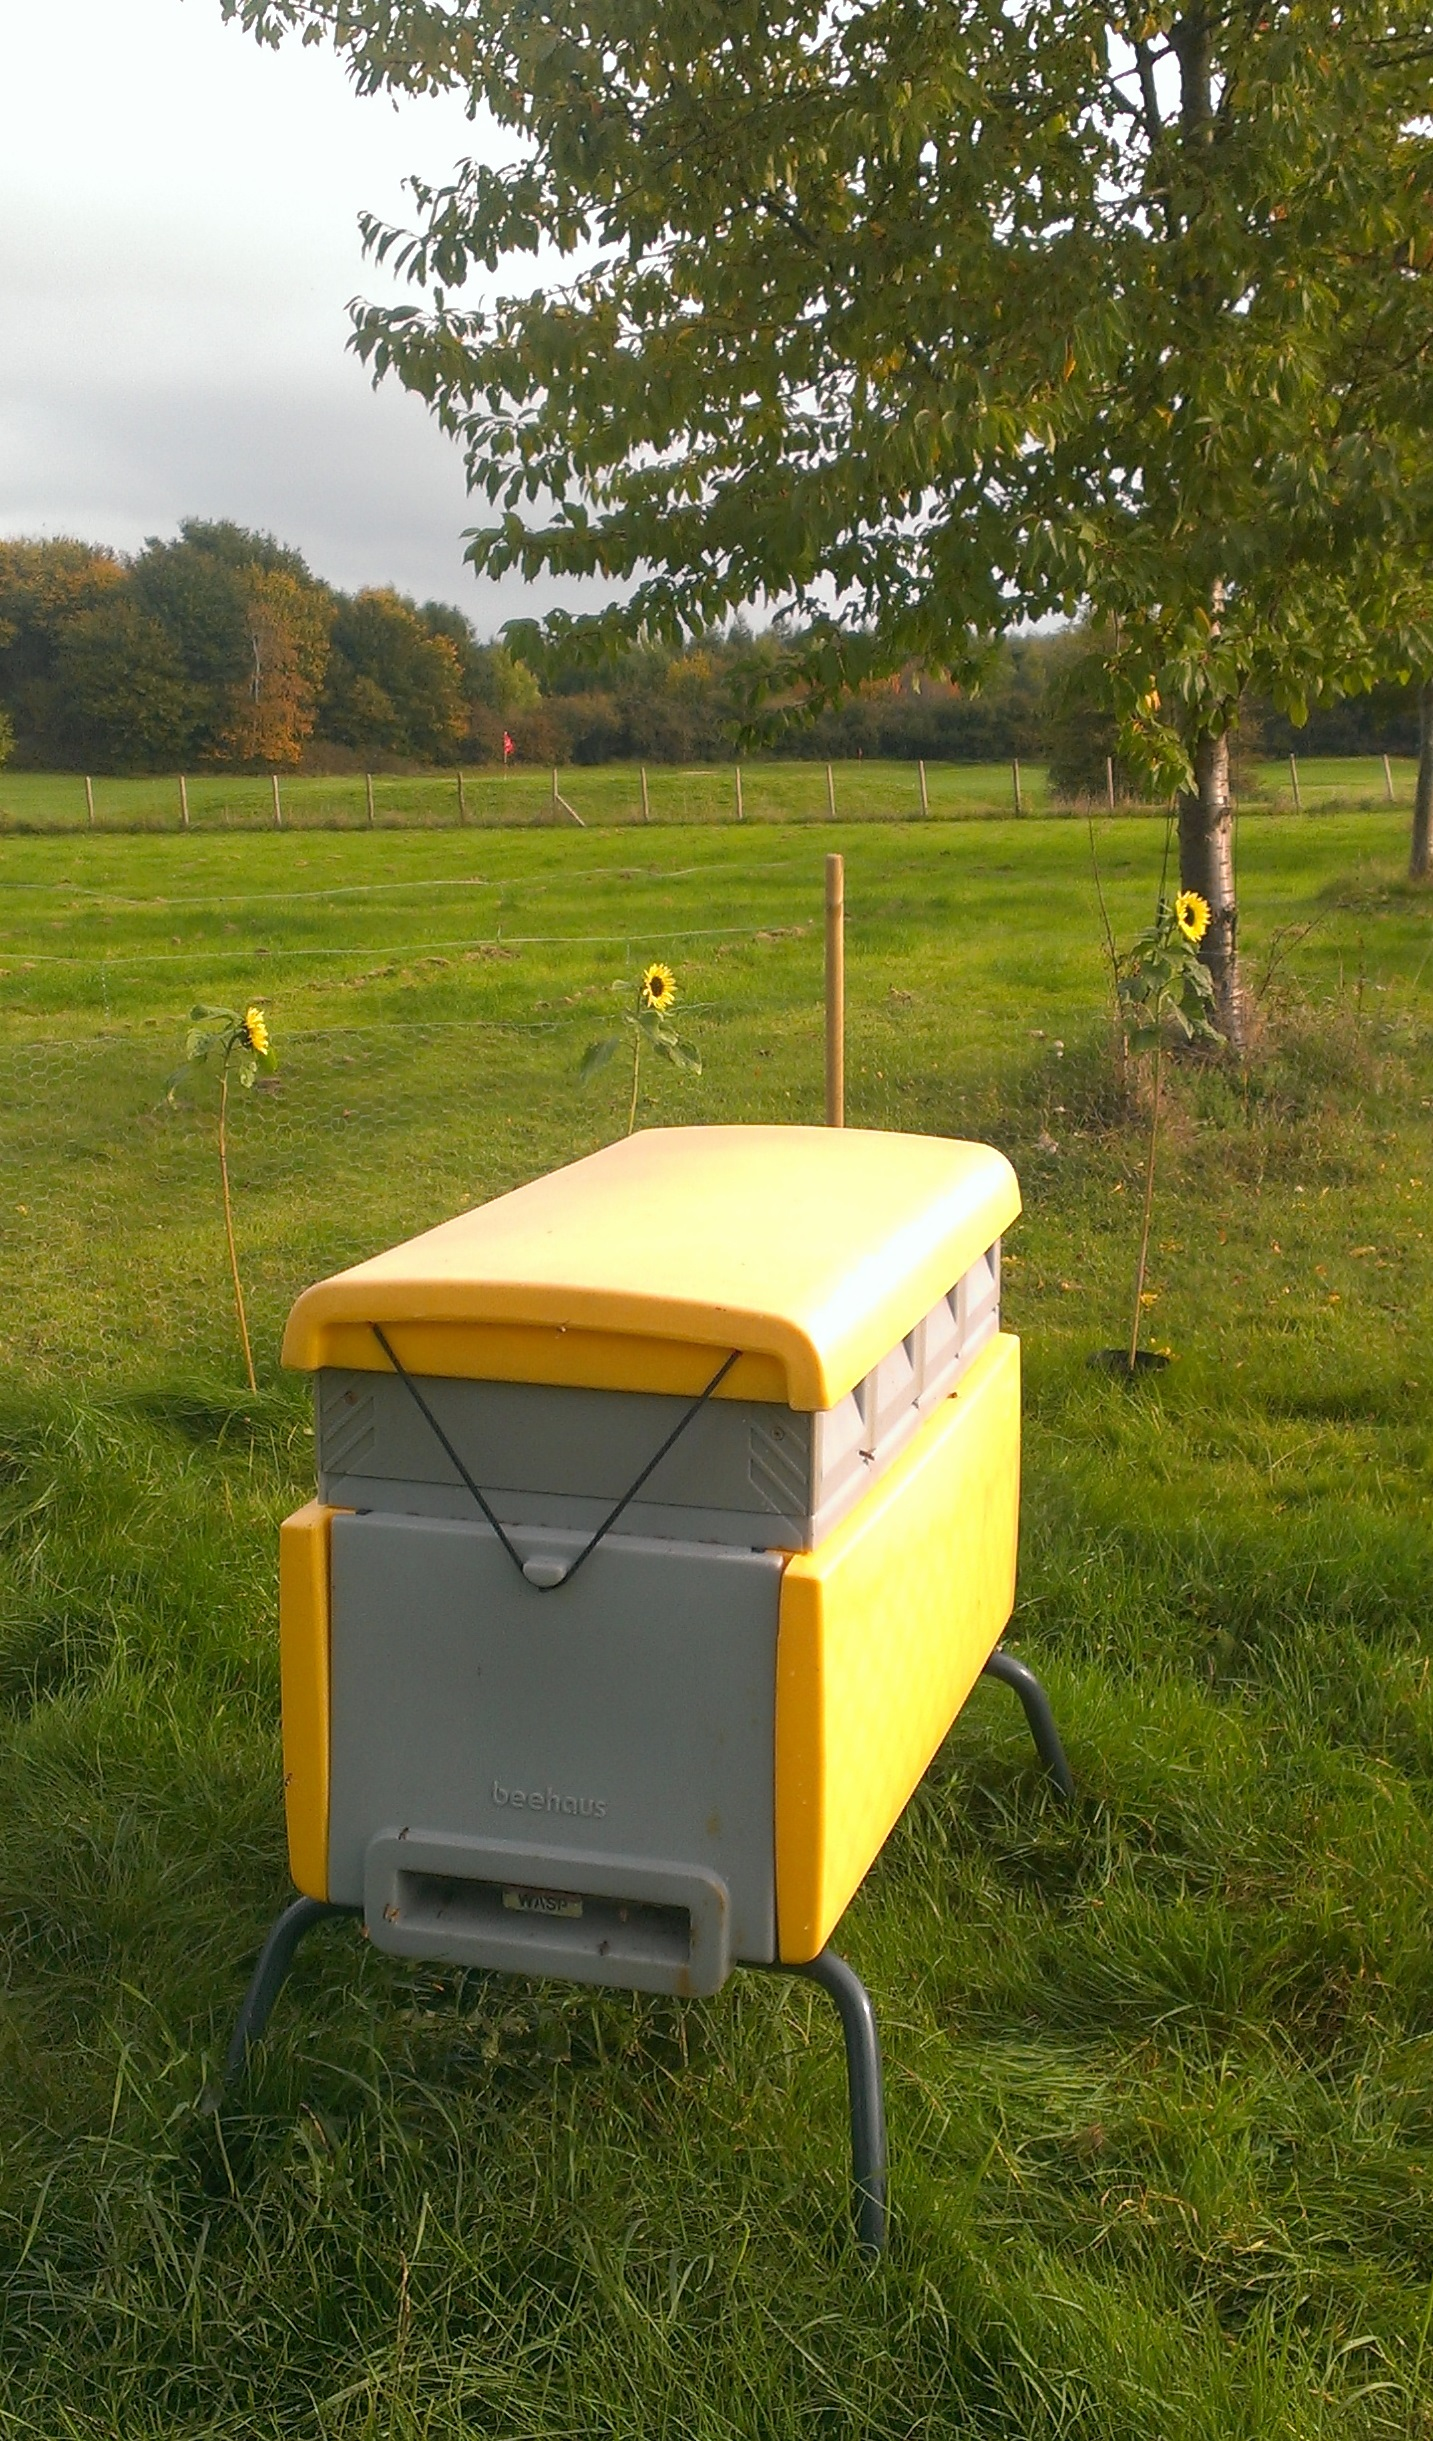 Beehaus hive